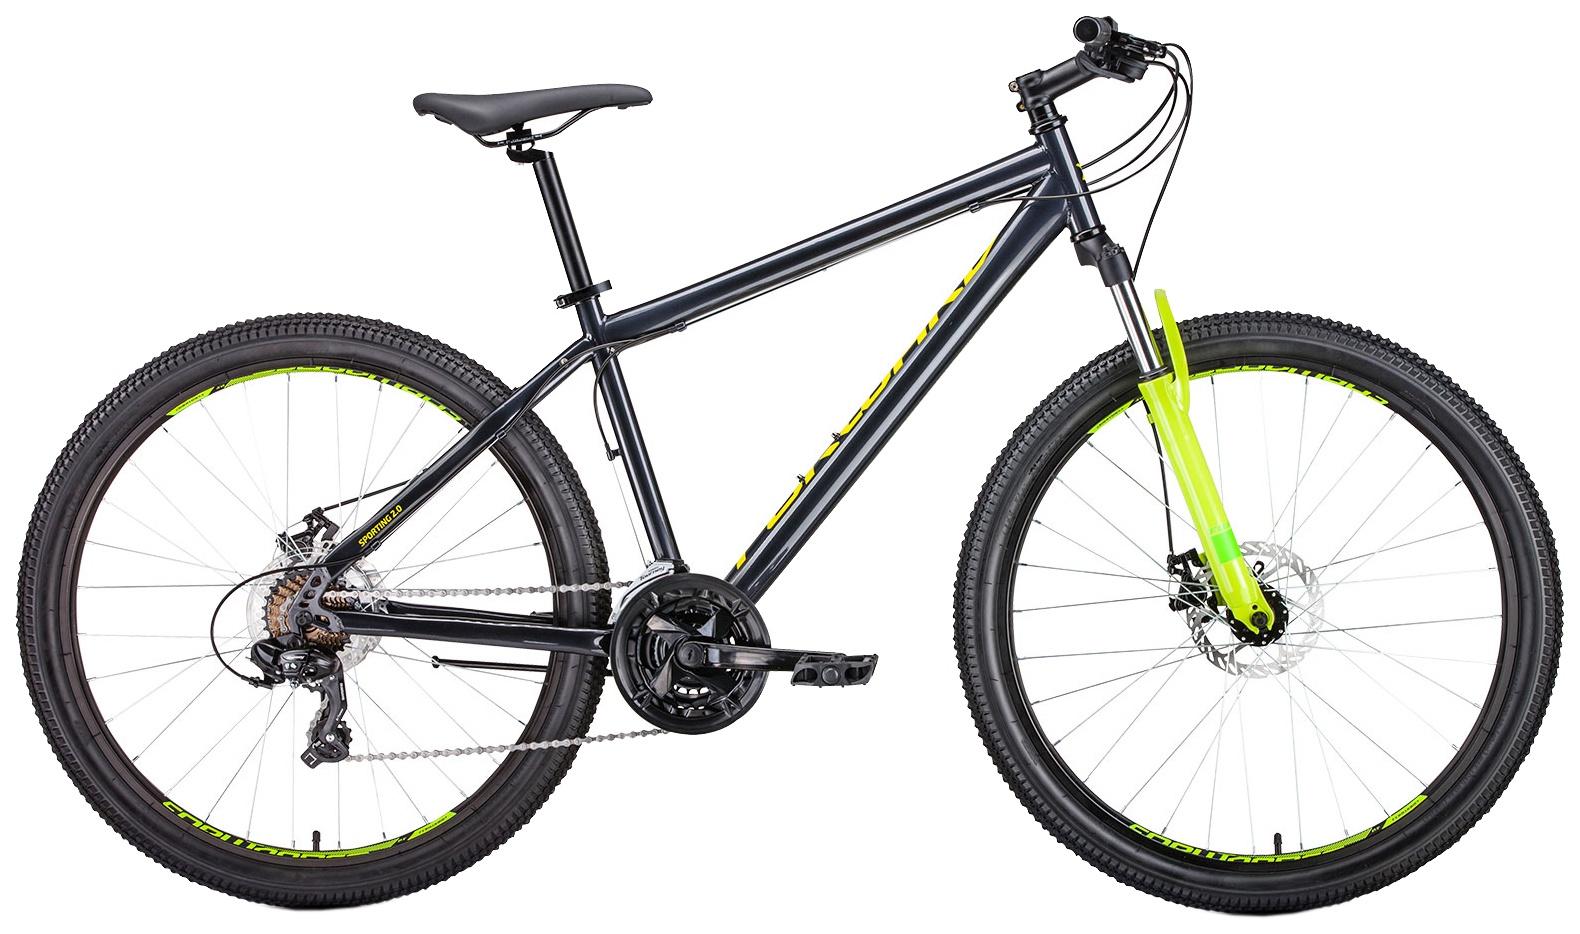 Велосипед Forward Sporting 27,5 2.0 disc , RBKW9MN7Q018, серый